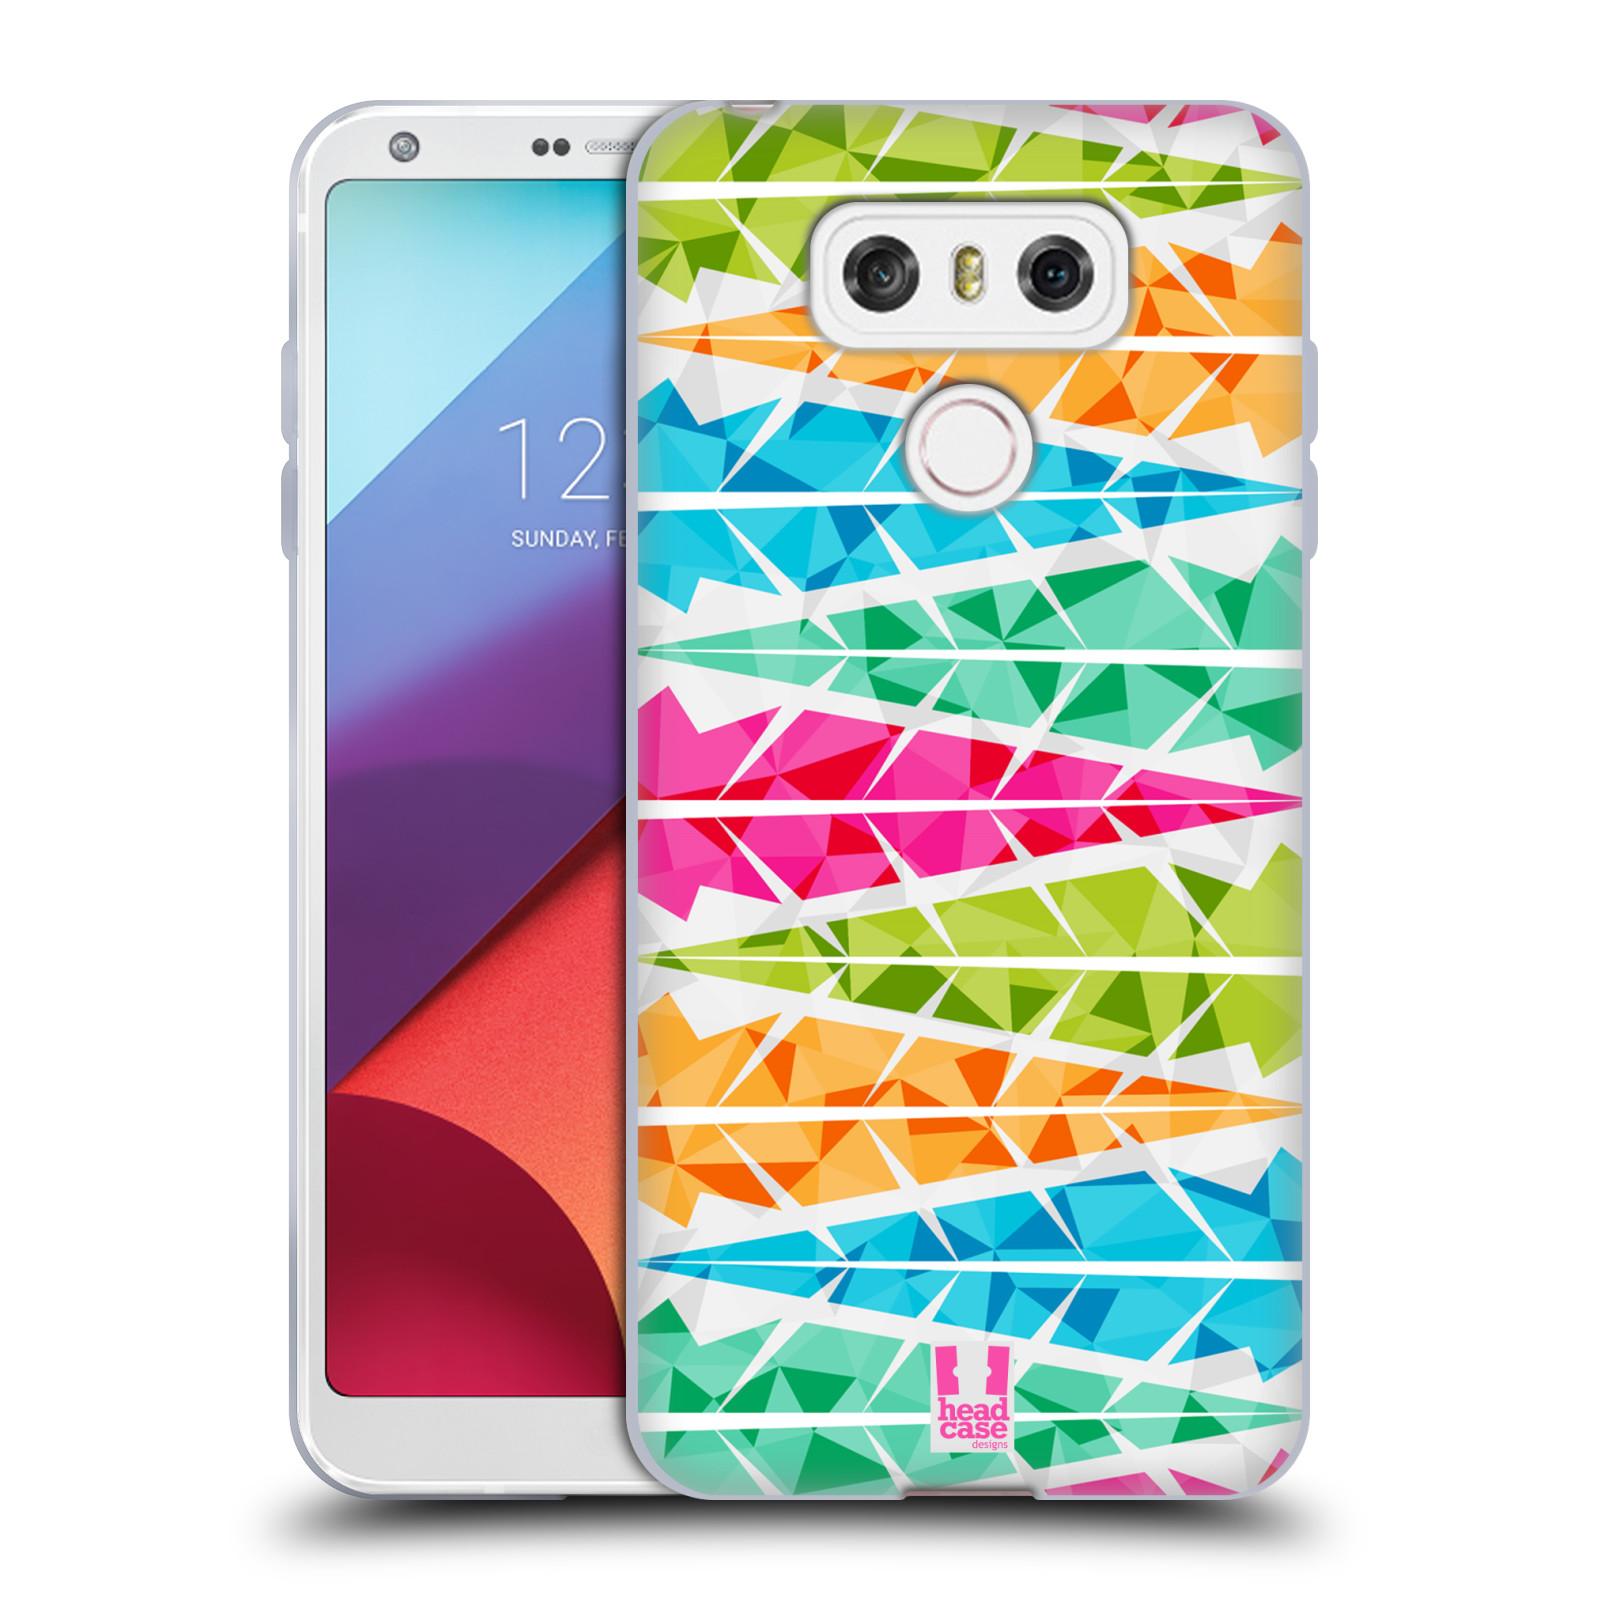 Silikonové pouzdro na mobil LG G6 - Head Case PÍRKA ALTERNATING (Silikonový kryt či obal na mobilní telefon LG G6 H870 / LG G6 Dual SIM H870DS)